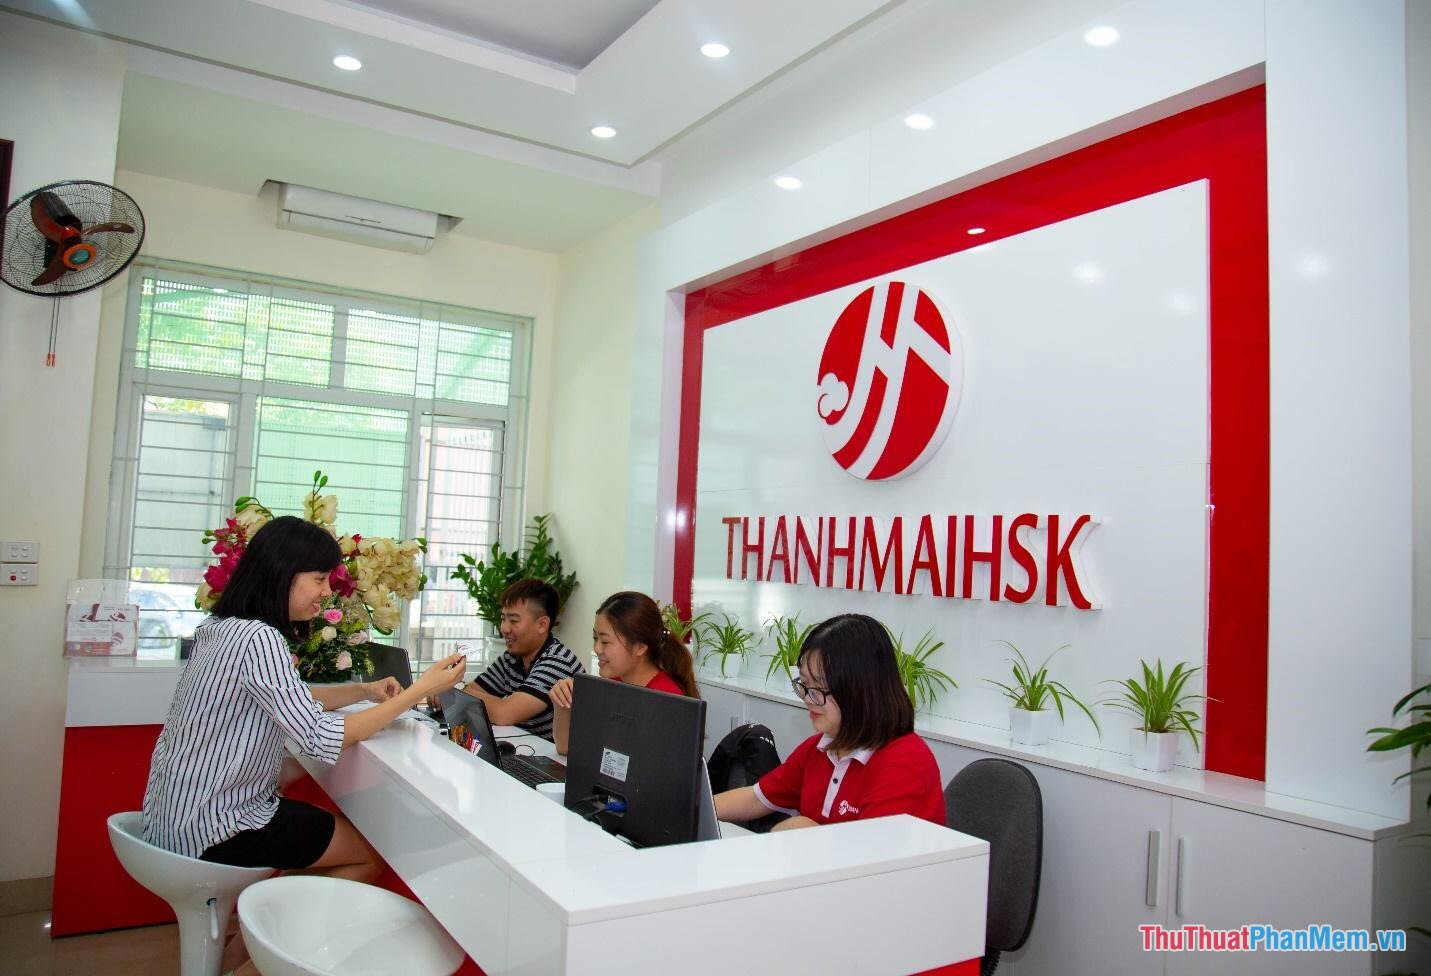 Trung tâm tiếng Trung THANHMAIHSK